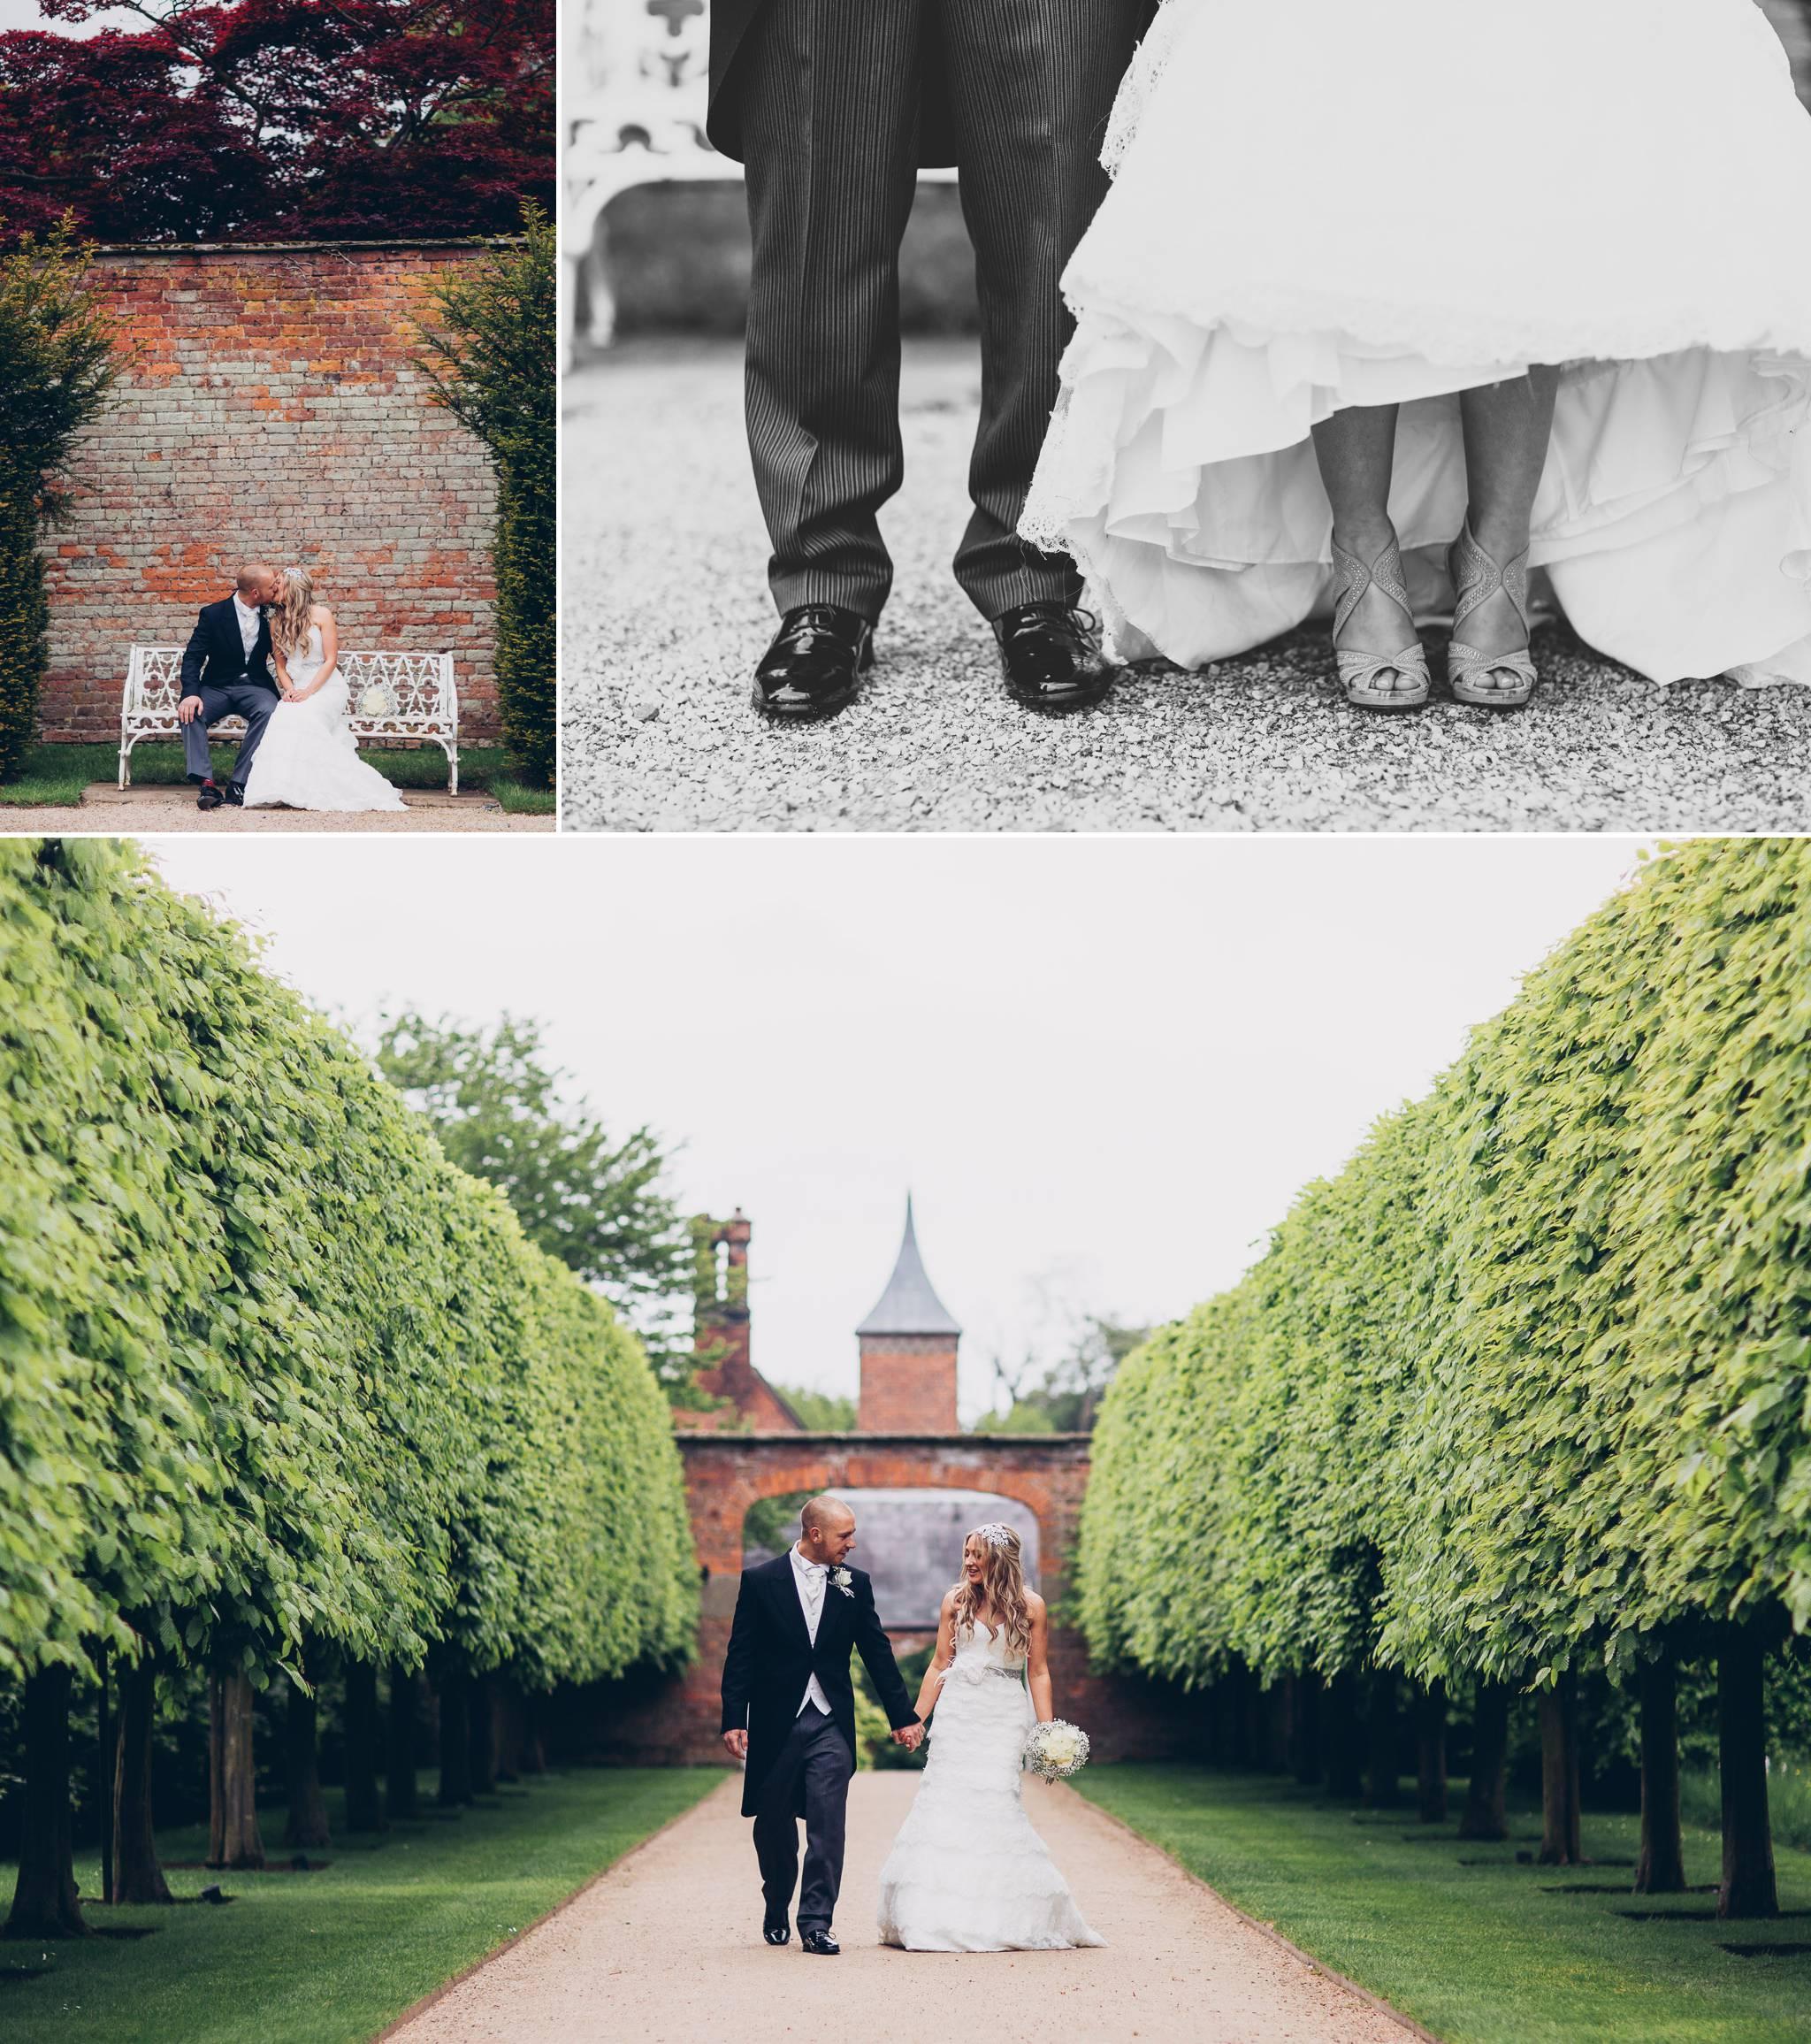 shropshire-wedding-photography 18.jpg